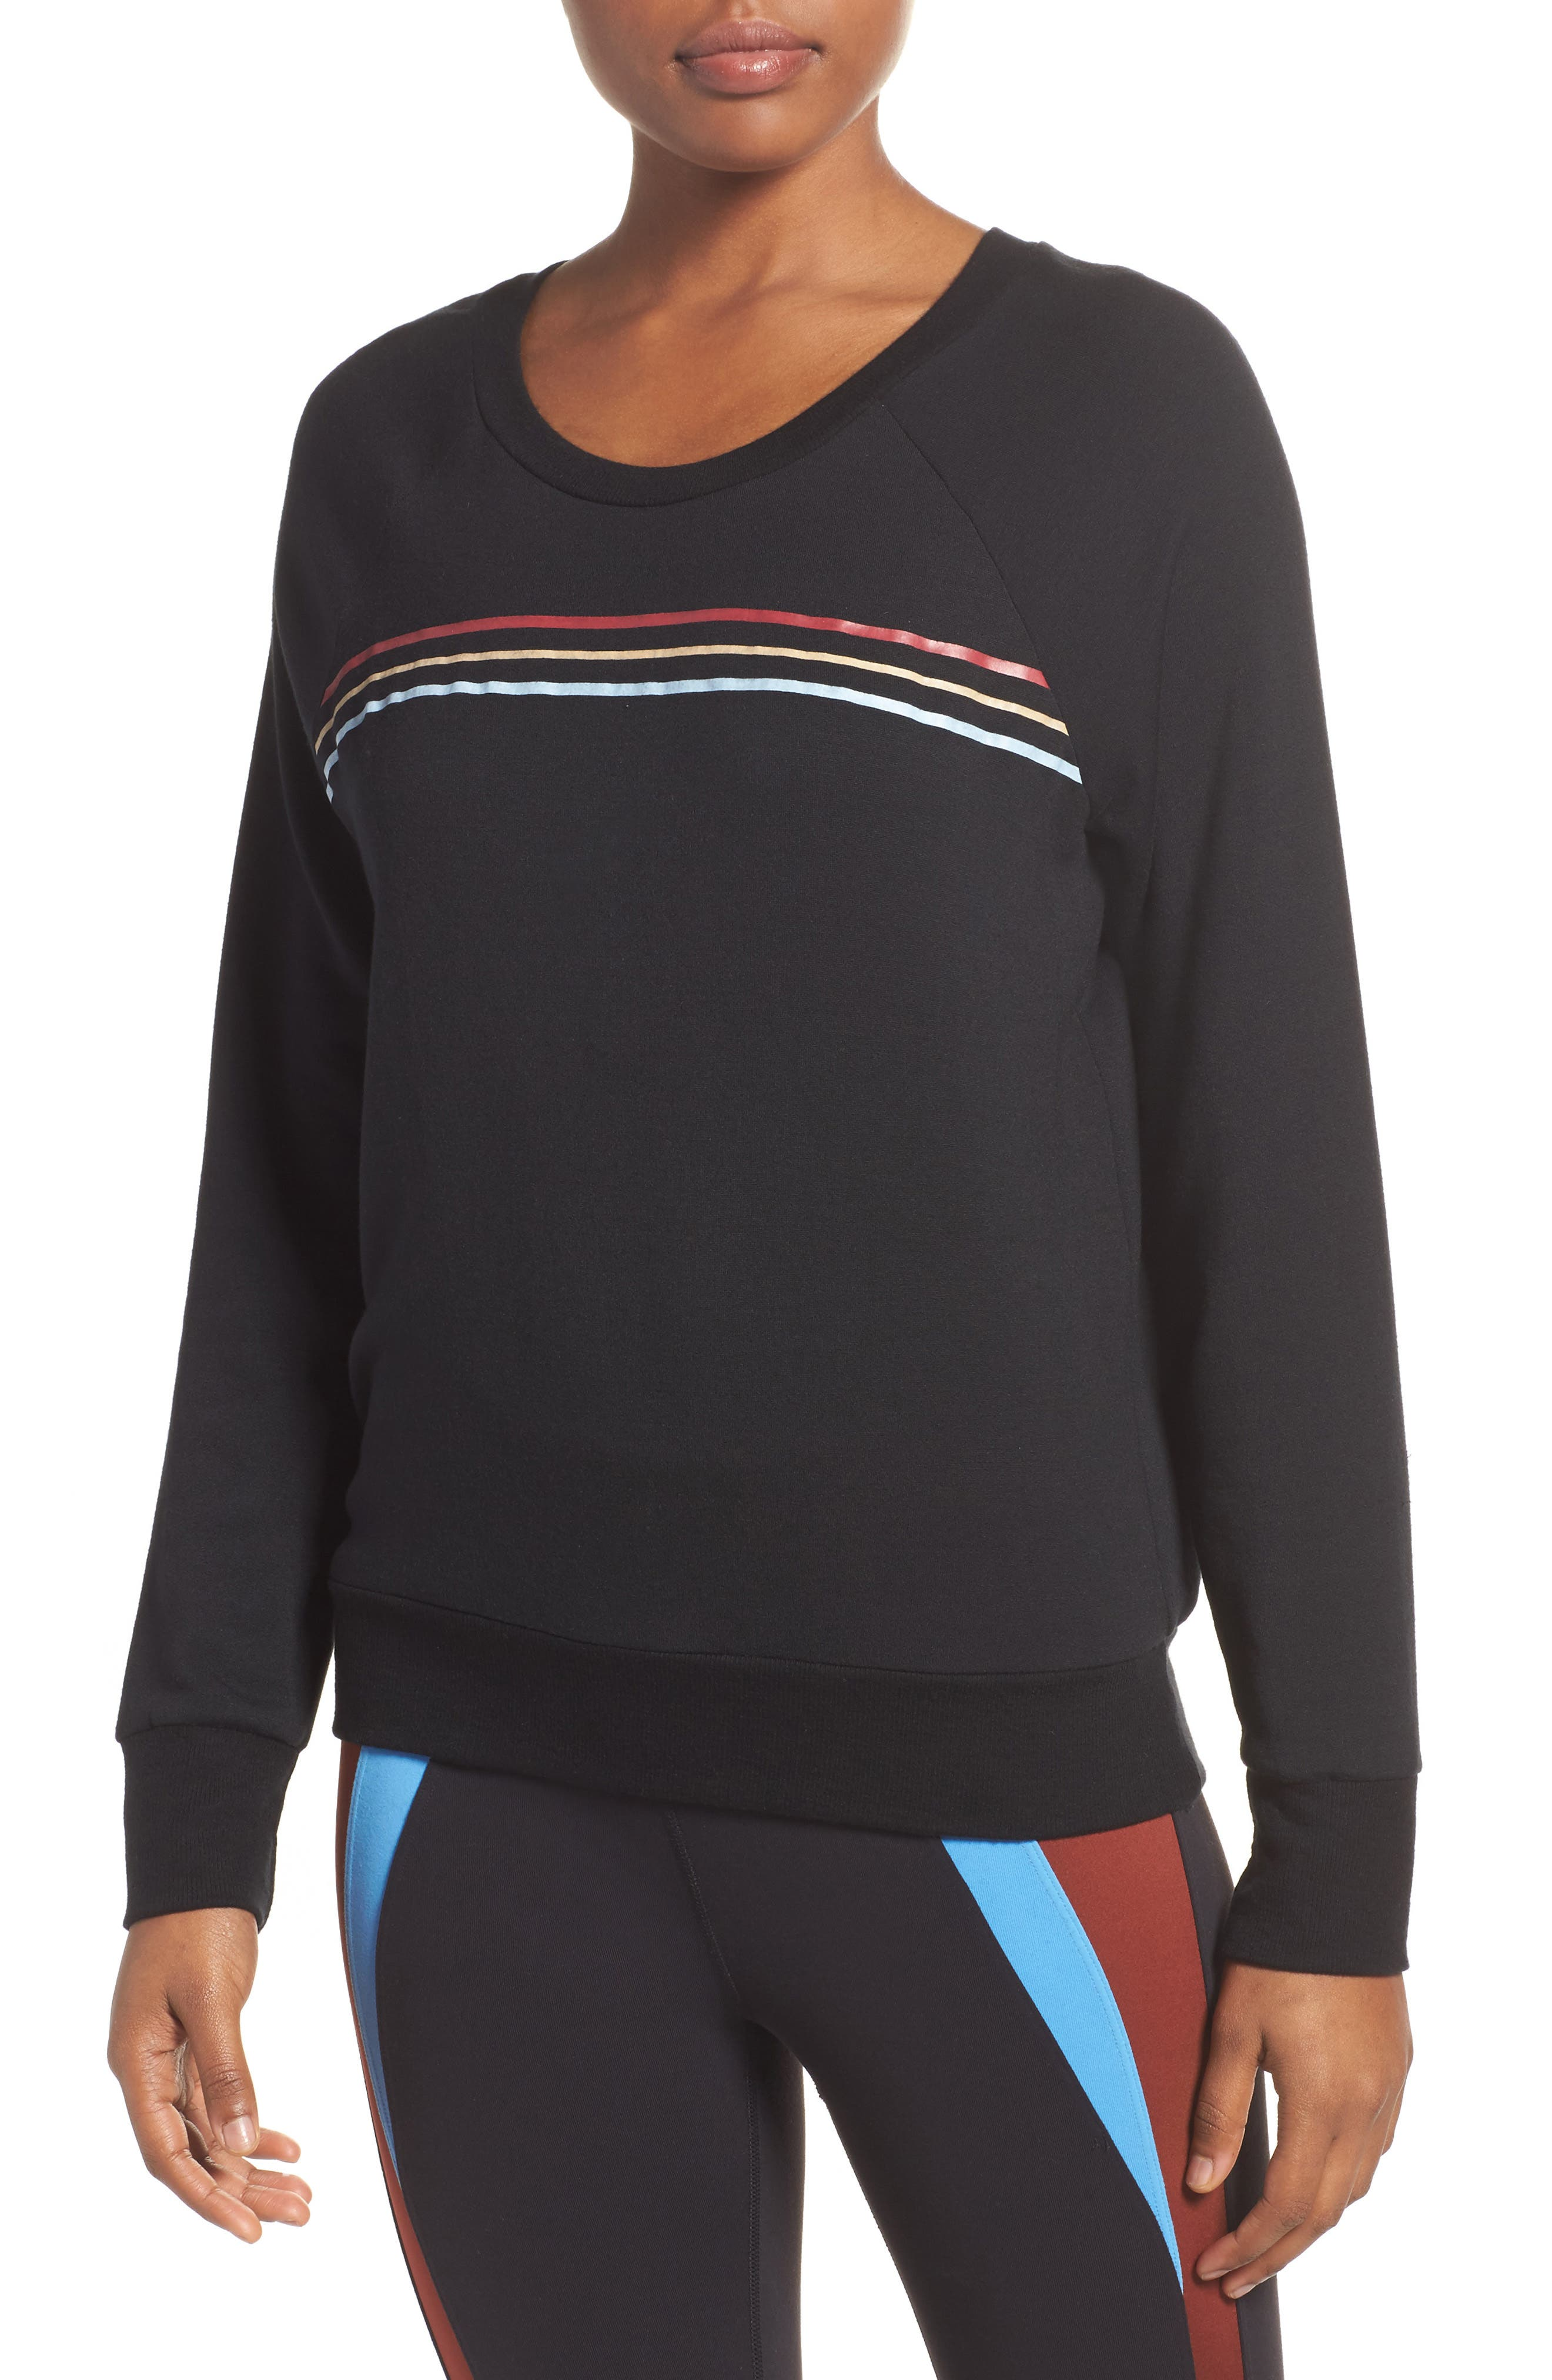 Alternate Image 1 Selected - Splits59 Edge Sweatshirt